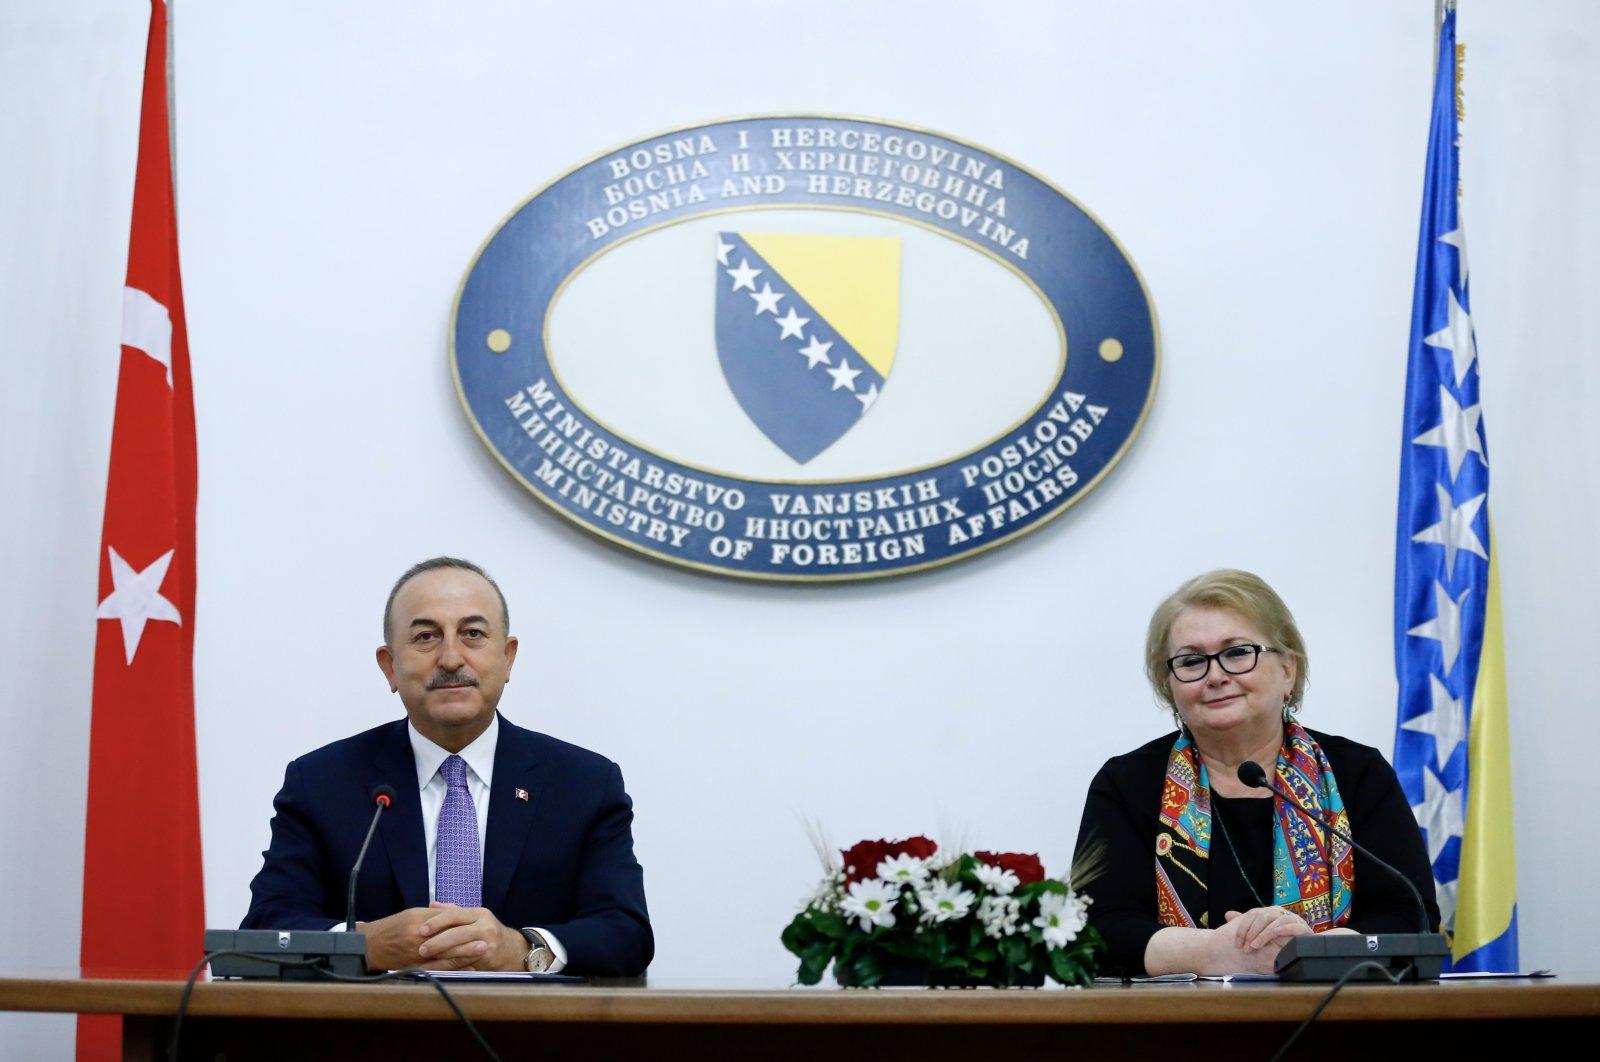 Foreign Minister Mevlüt Çavuşoğlu (L) and Bosnia-Herzegovina's Foreign Minister Bisera Turkovic speak at a joint press conference in Sarajevo, Bosnia and Herzegovina, May 5, 2021. (AA Photo)